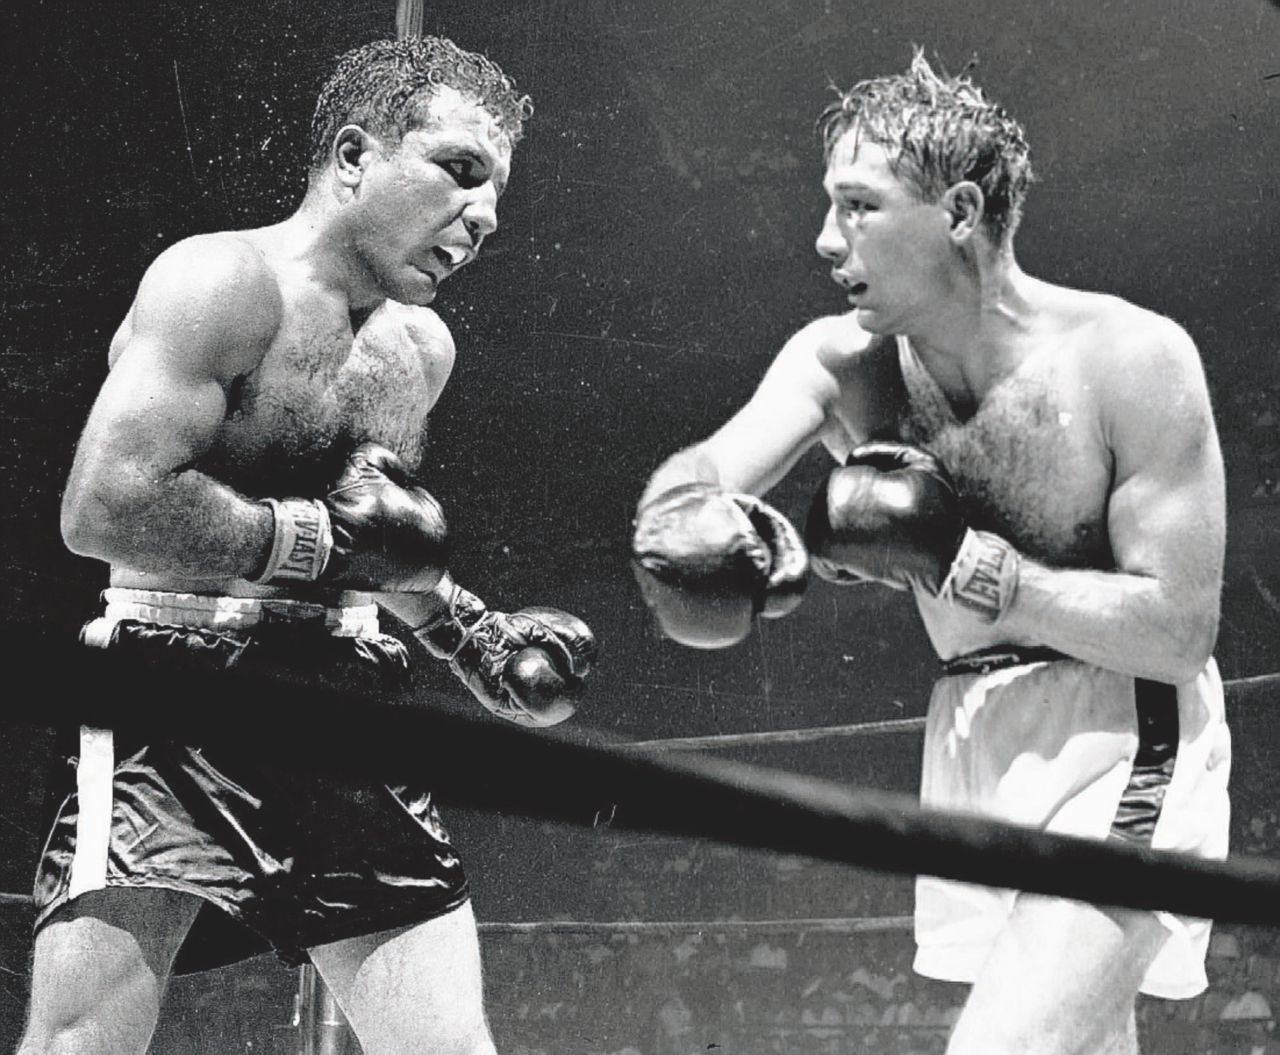 Jack LaMotta, il kamikaze del ring che ispirò Scorsese